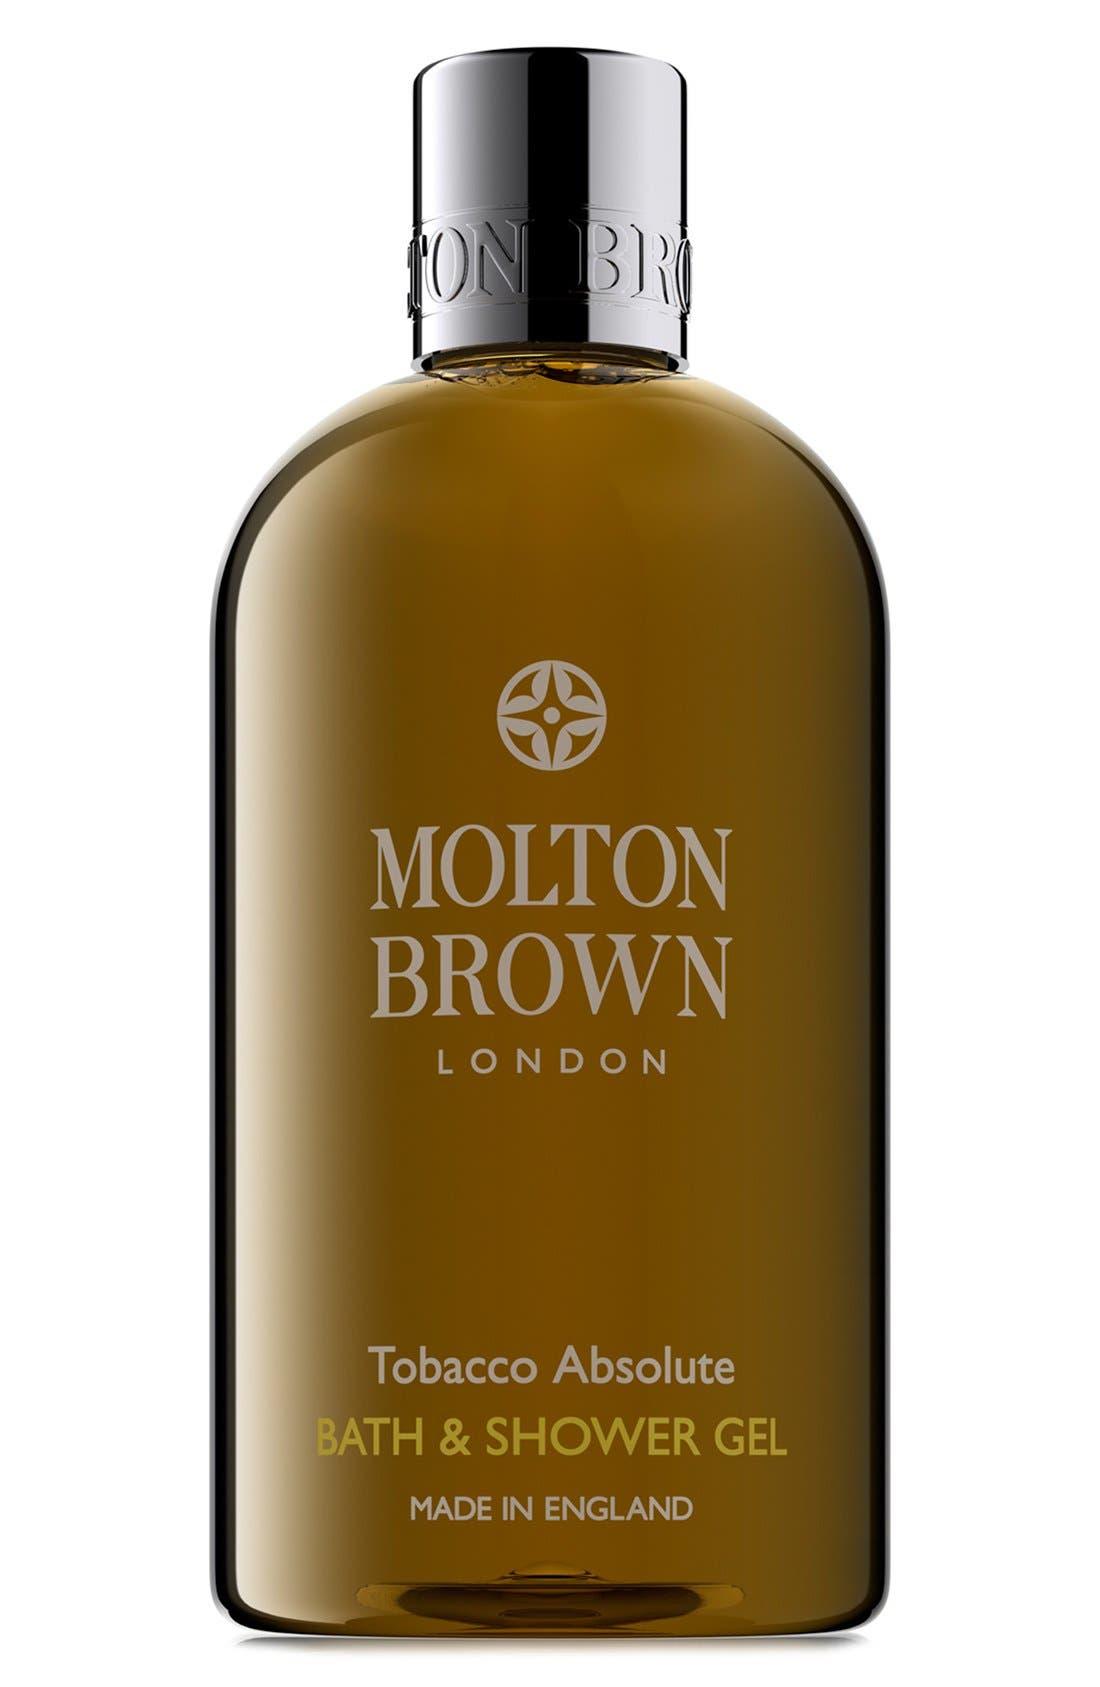 MOLTON BROWN London Body Wash